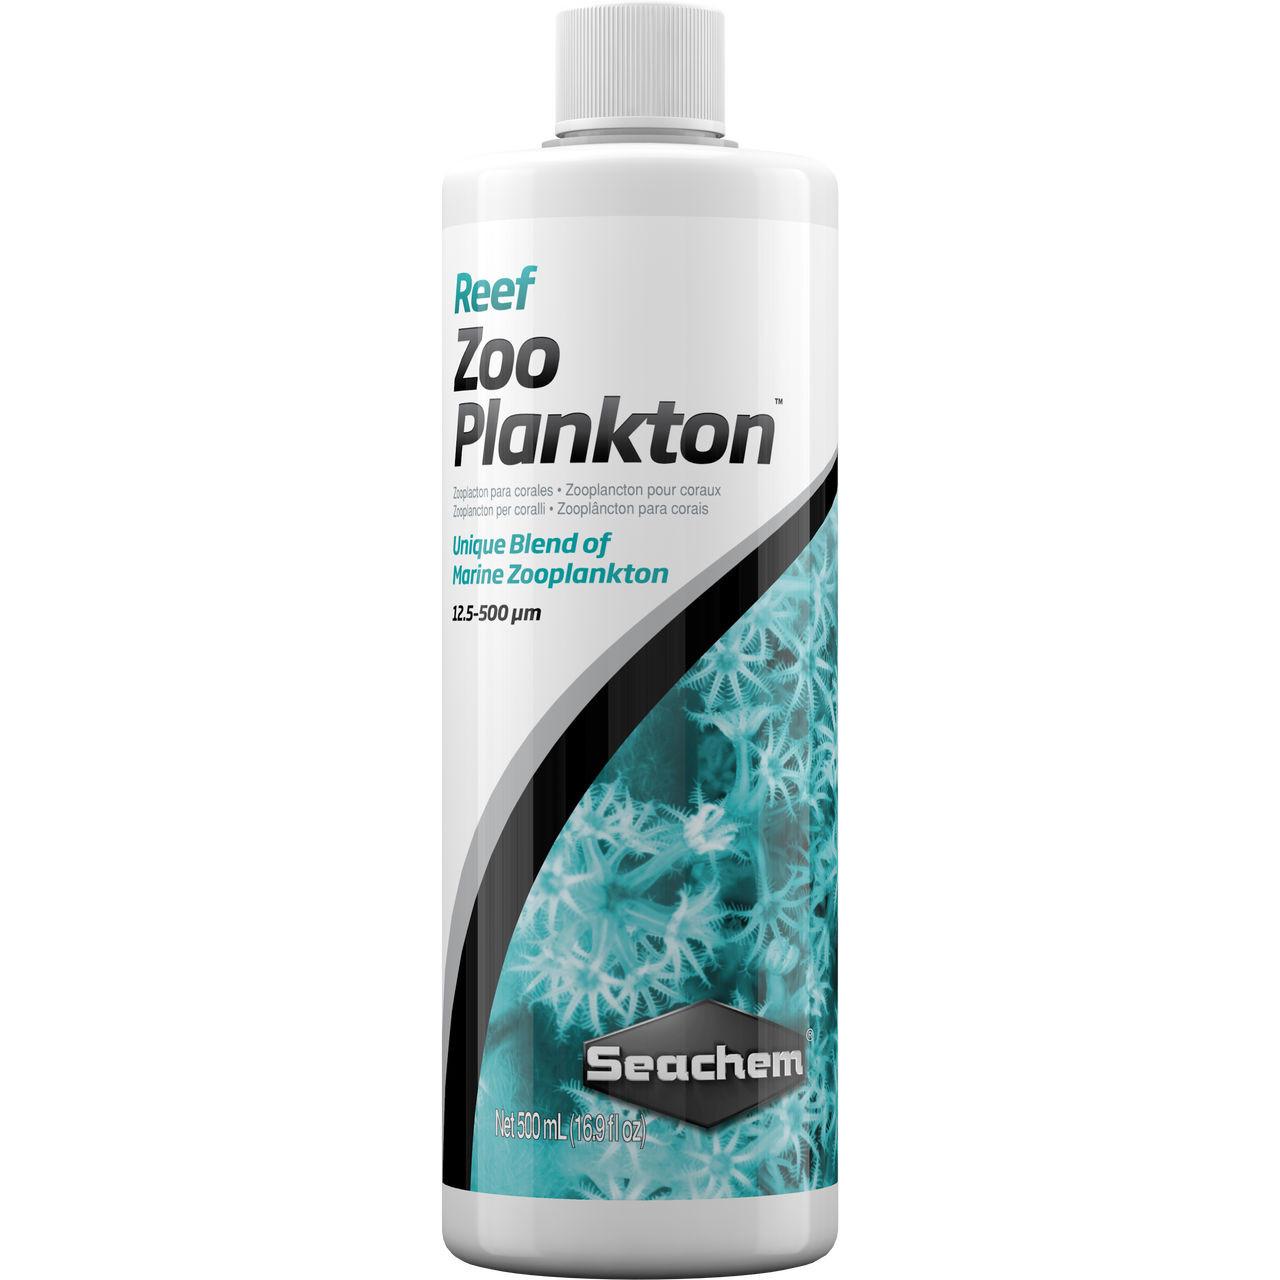 Reef Zooplankton (500 mL) - Seachem - SaltwaterAquarium.com